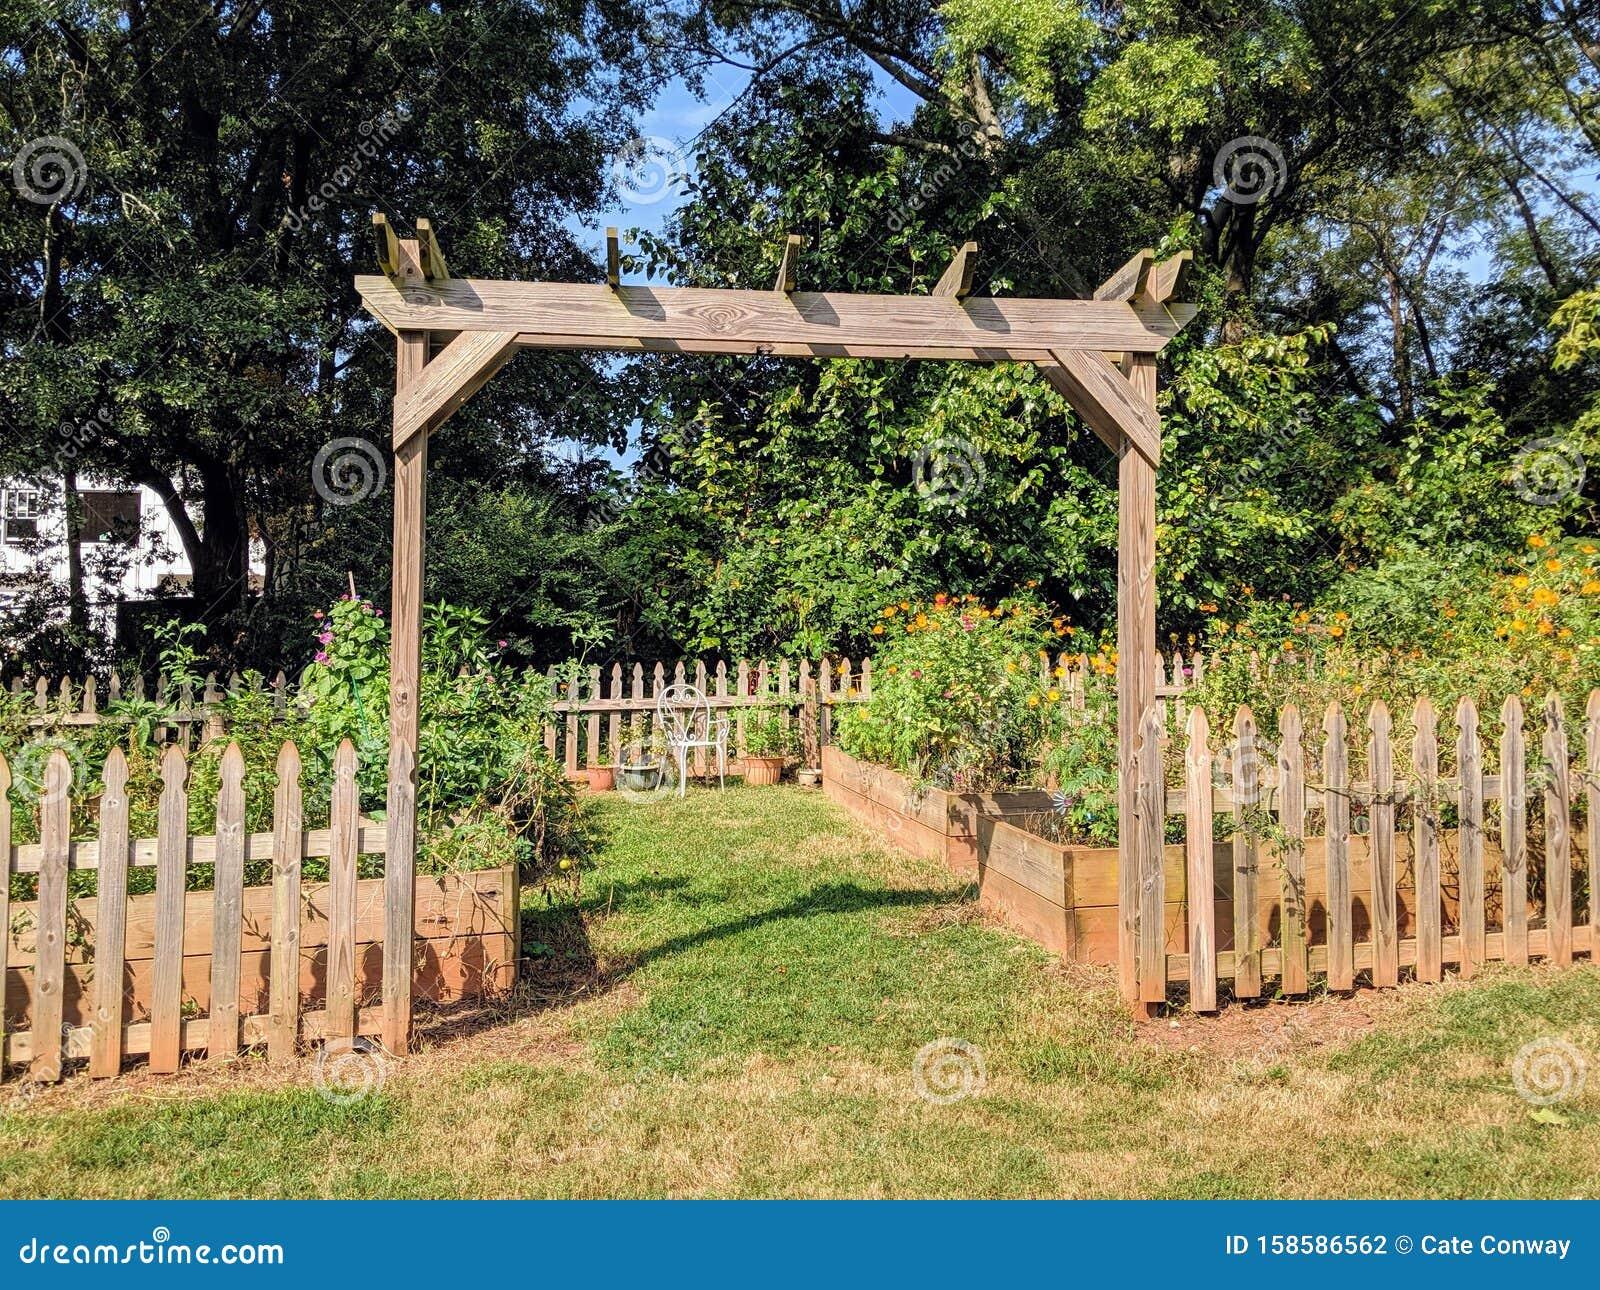 Community Garden Trellis With Wood Fence Stock Photo Image Of